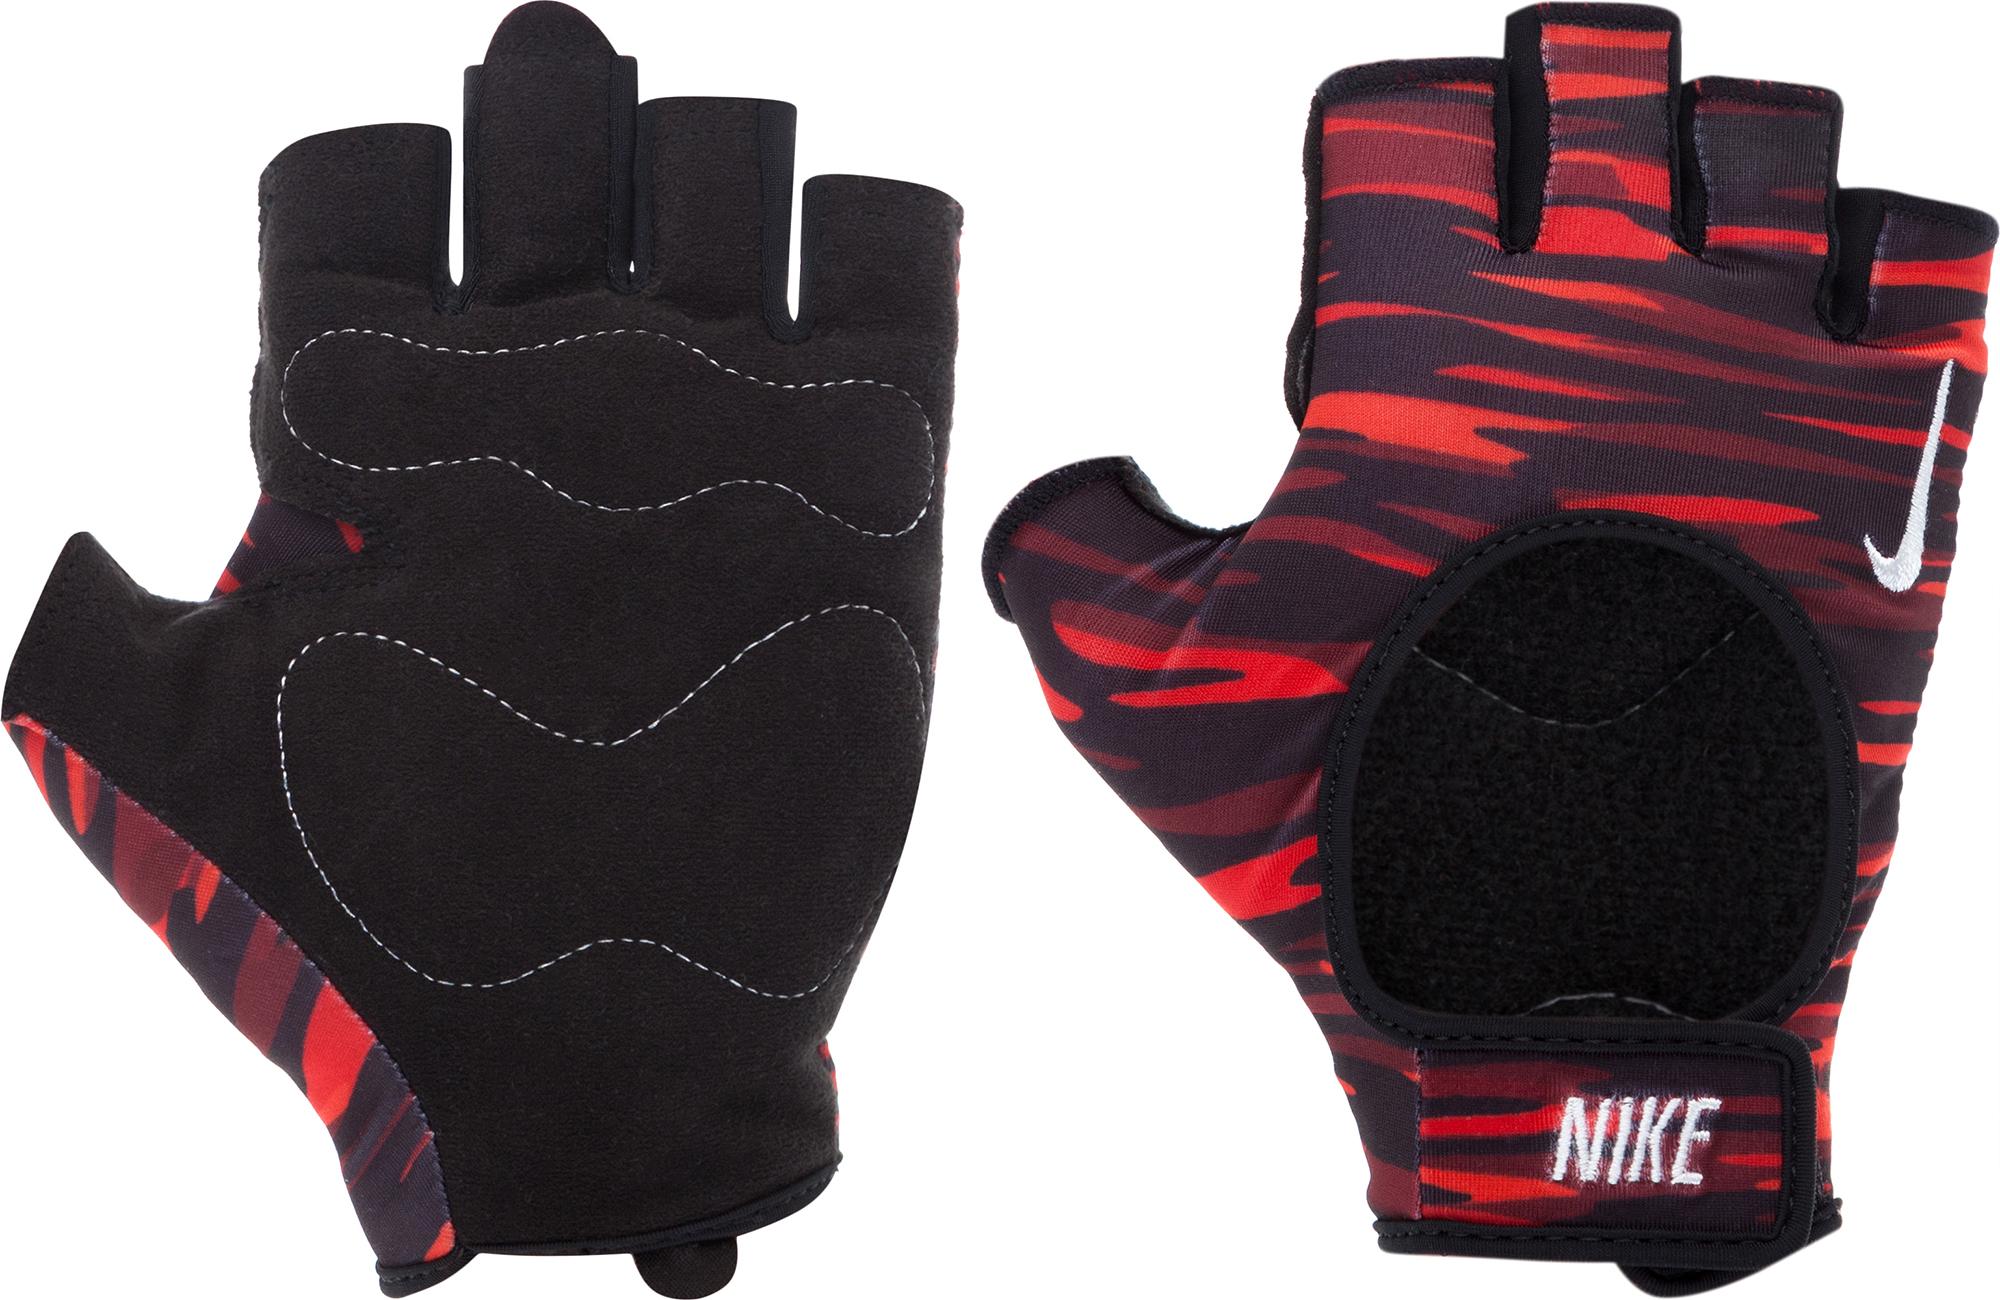 Nike Перчатки для фитнеса женские Nike, размер 7.5